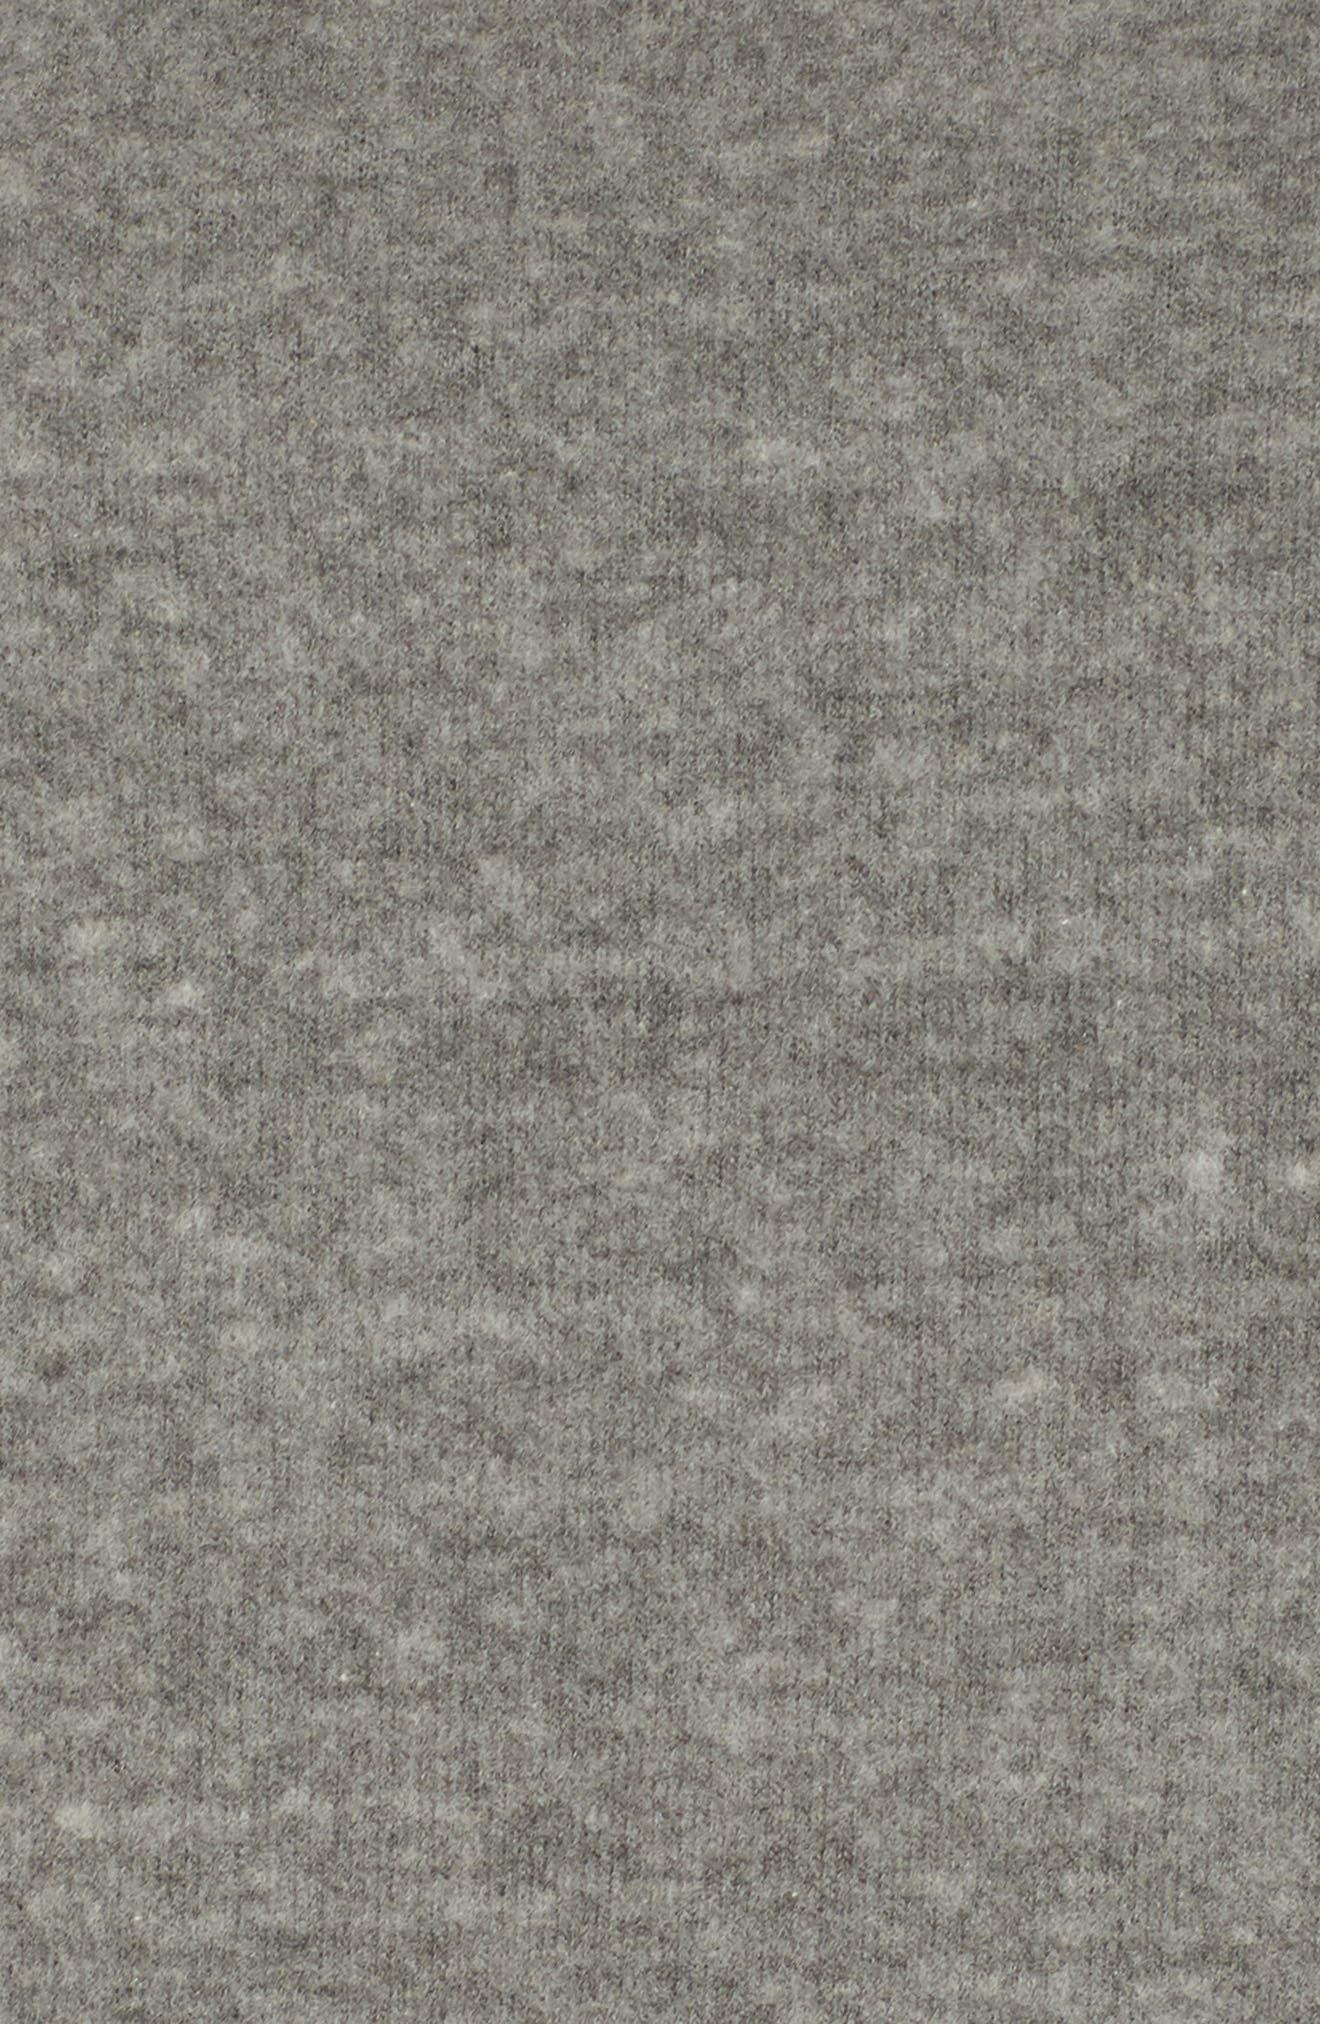 Roselynn Hello, Weekend Sweatshirt,                             Alternate thumbnail 6, color,                             020